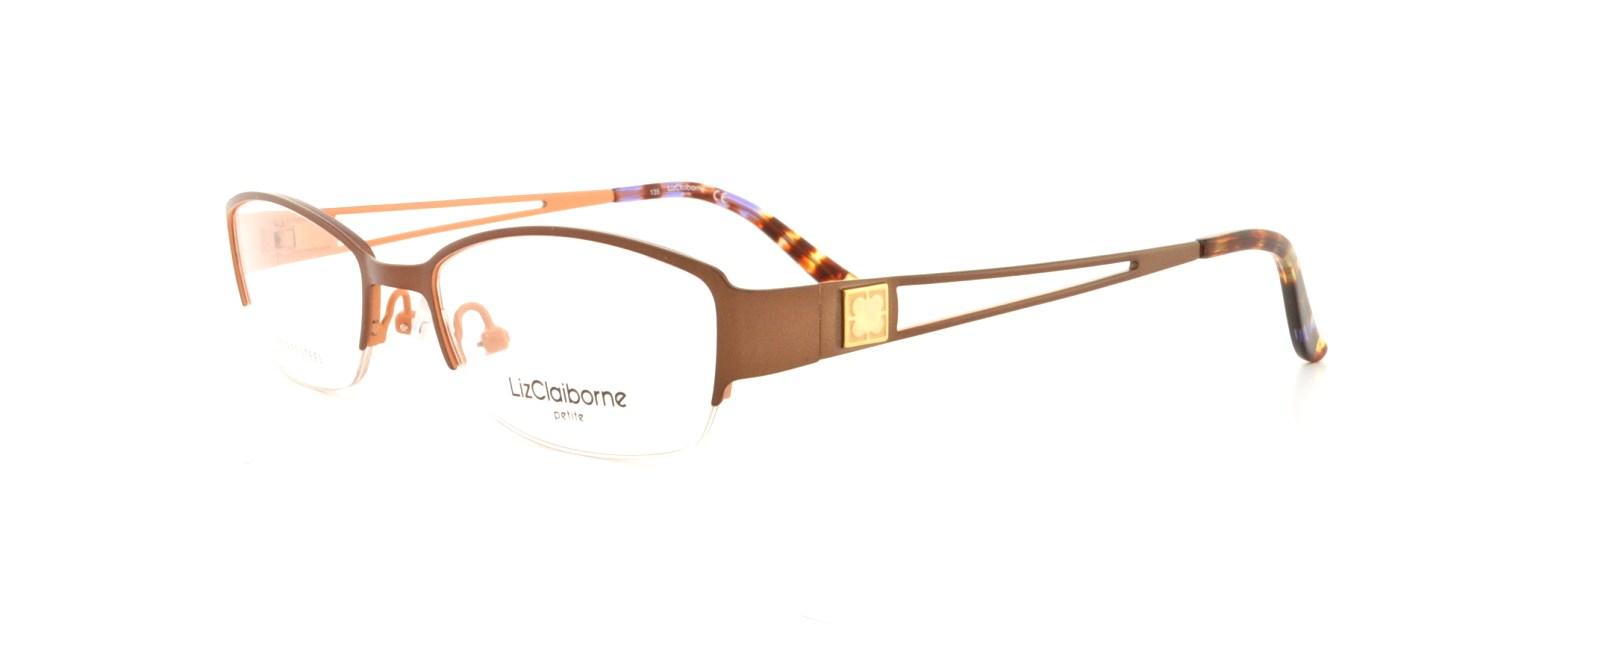 LIZ CLAIBORNE Eyeglasses 417 0FL9 Camel Peach 48MM 716737057957 | eBay